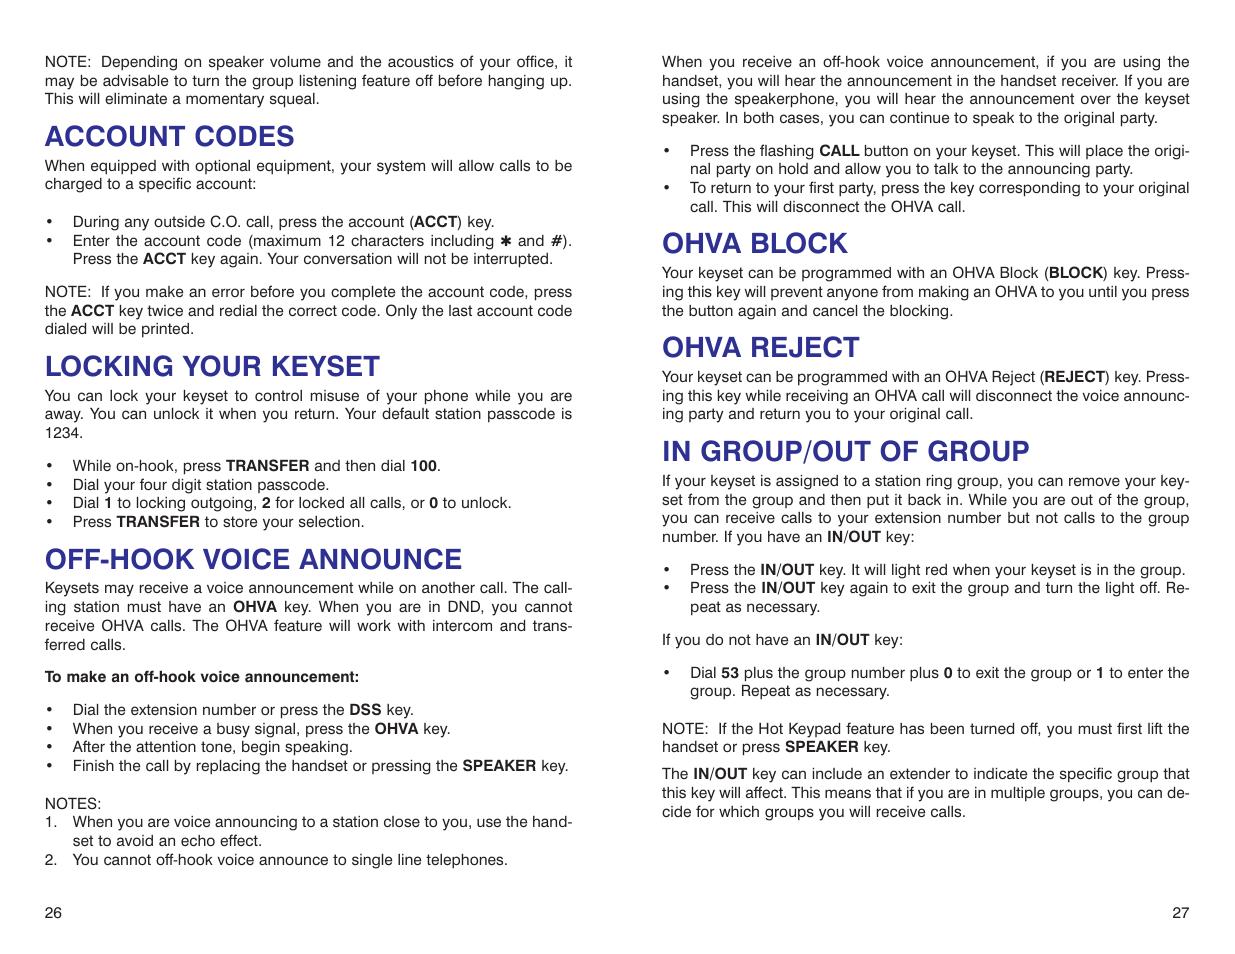 Ohva block, Ohva reject, Account codes | Samsung DS 24D User